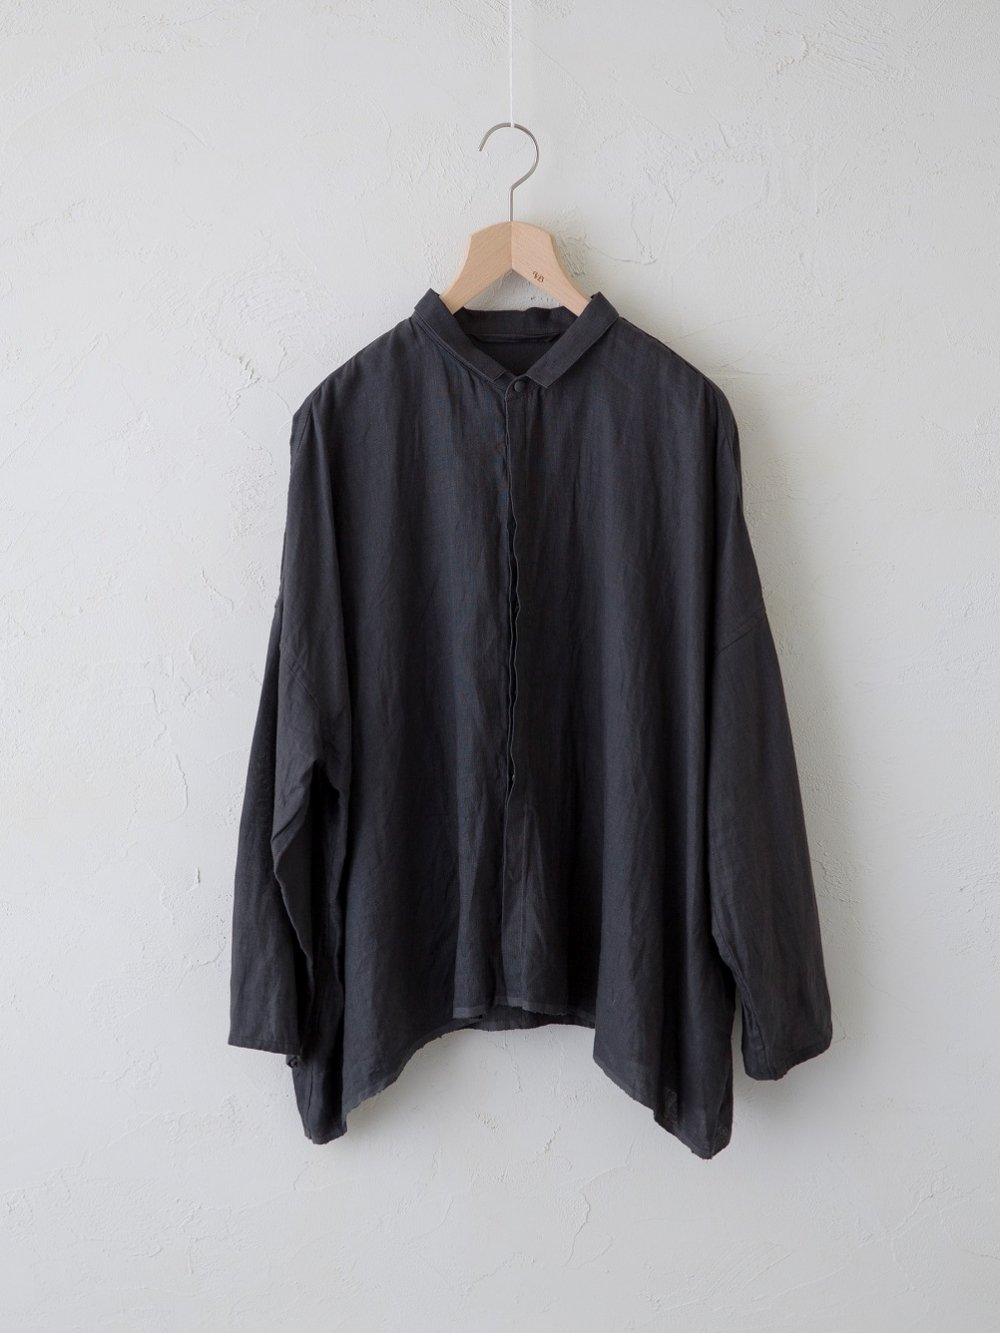 KL Vintage 長袖ワイドシャツ